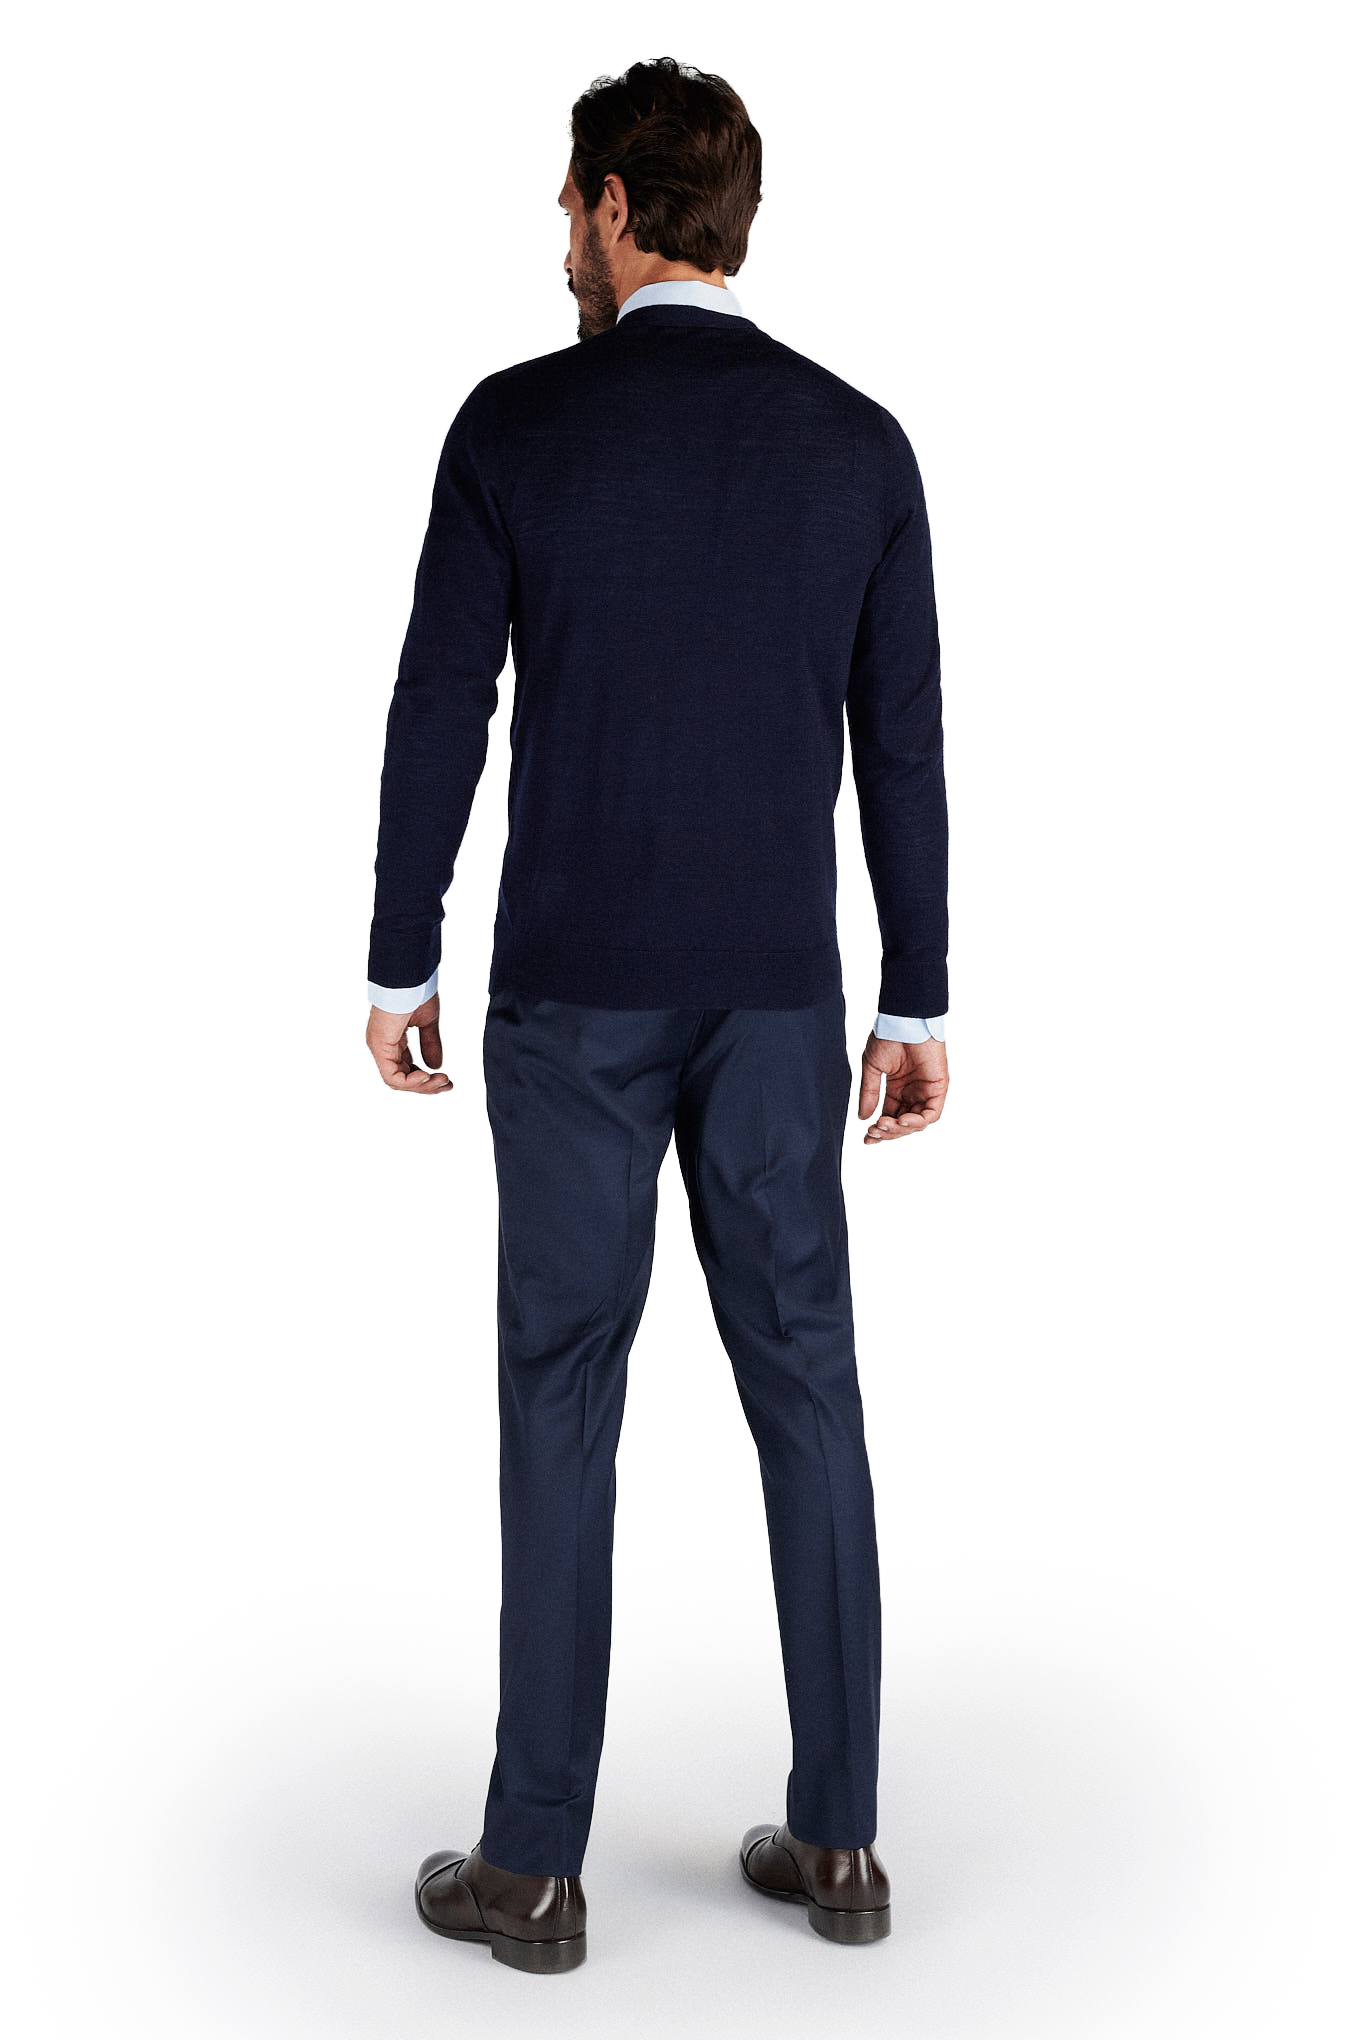 Cardigan Azul Escuro Casual Homem